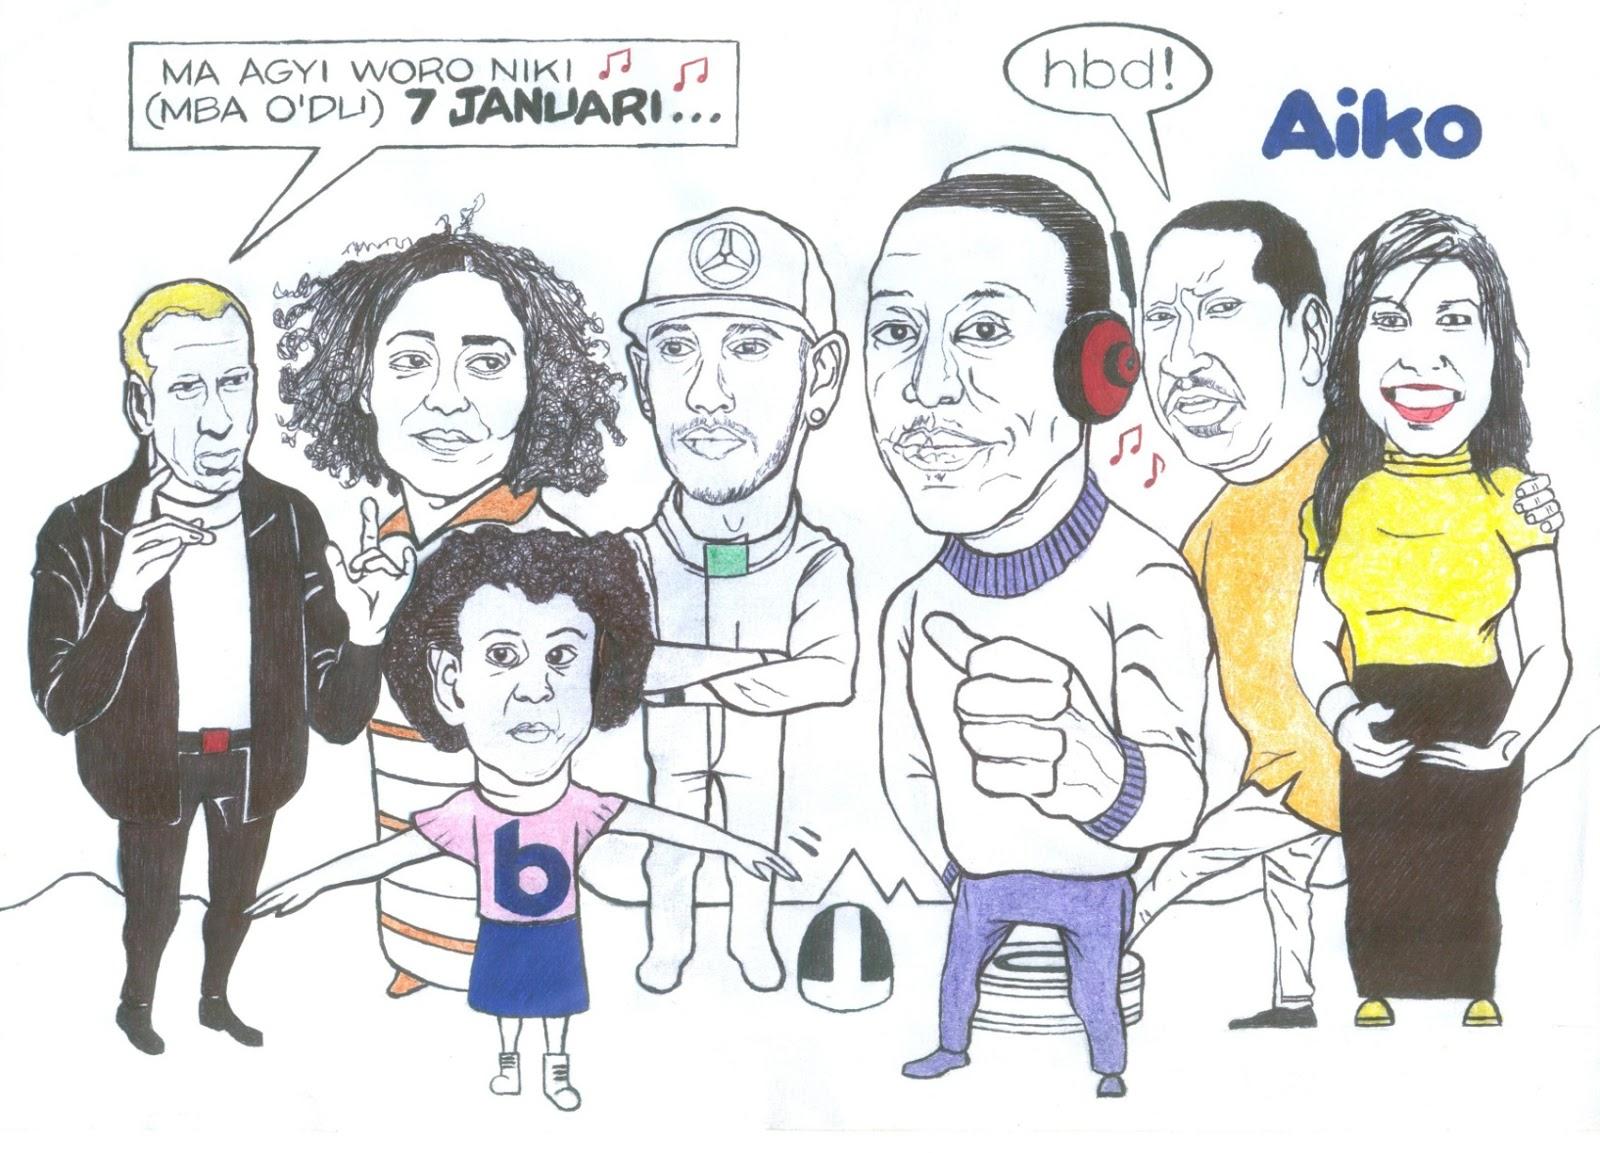 Aruacartoons Cartoongineering Razor Fence Wire And Electric Installation Kampala O Olxco